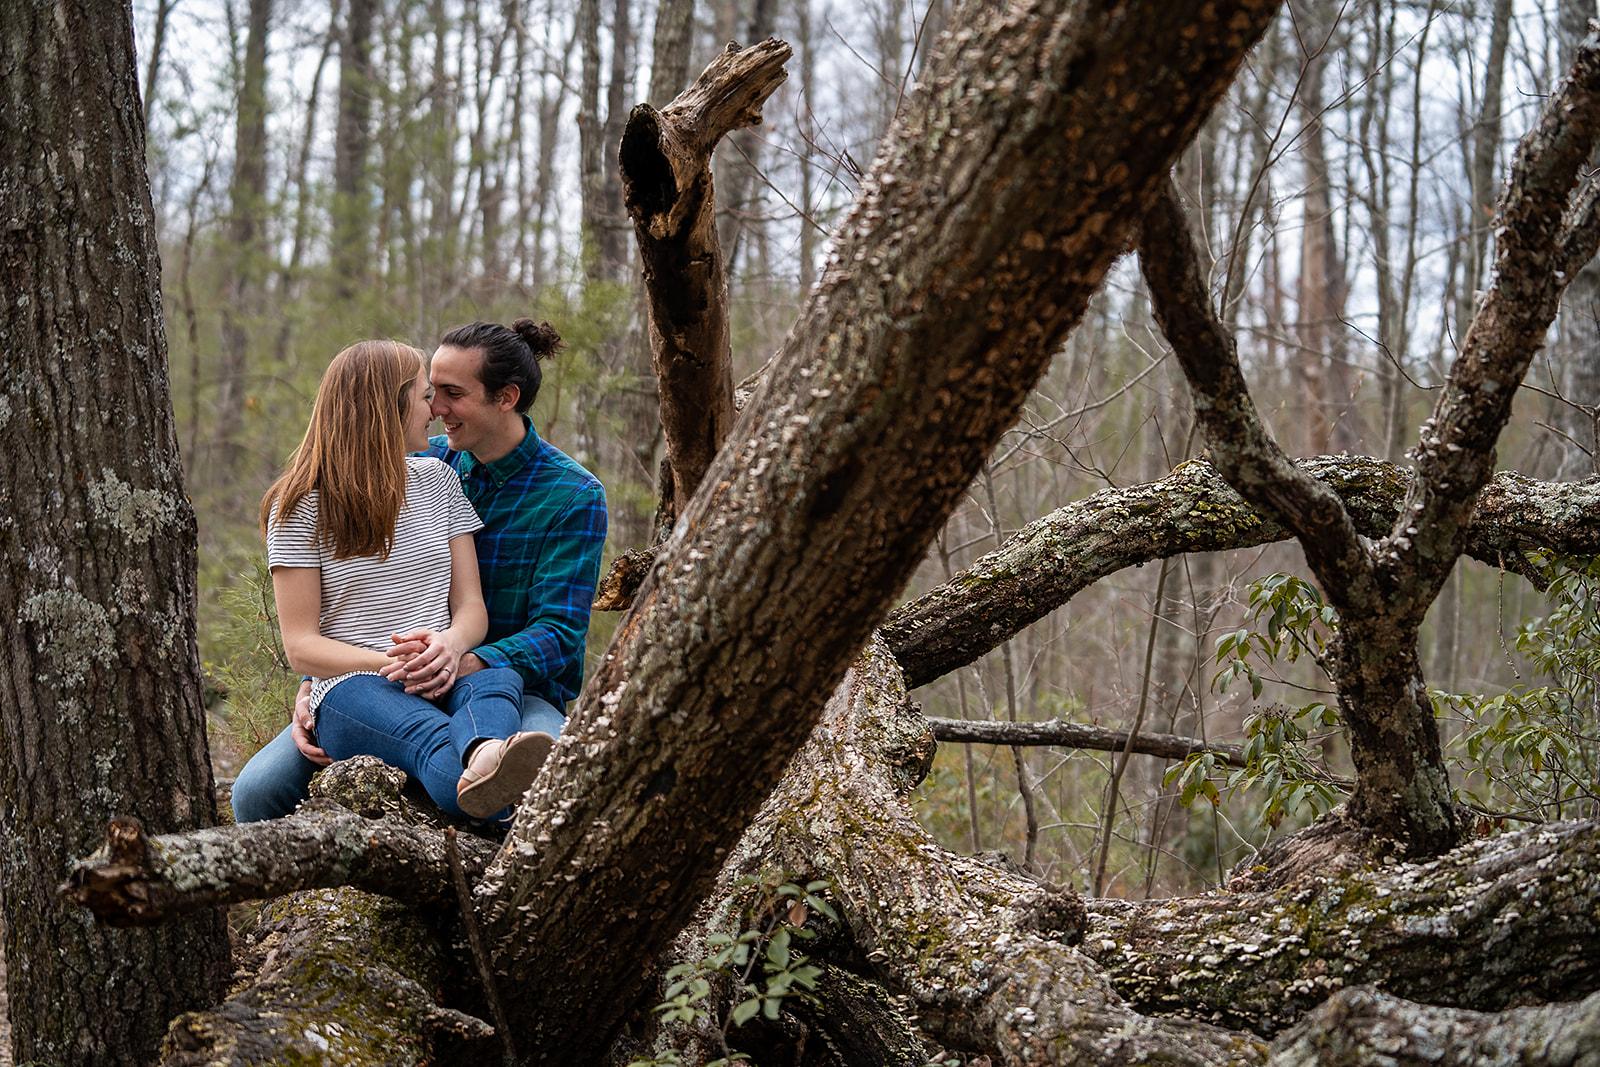 Bear Creative Co, Columbus Ohio Photographer, Columbus Ohio Wedding Photographer, Covington Ohio, Farm Wedding, Adventure Session, Kentucky Engagement, Columbus Ohio, Destination Photographer